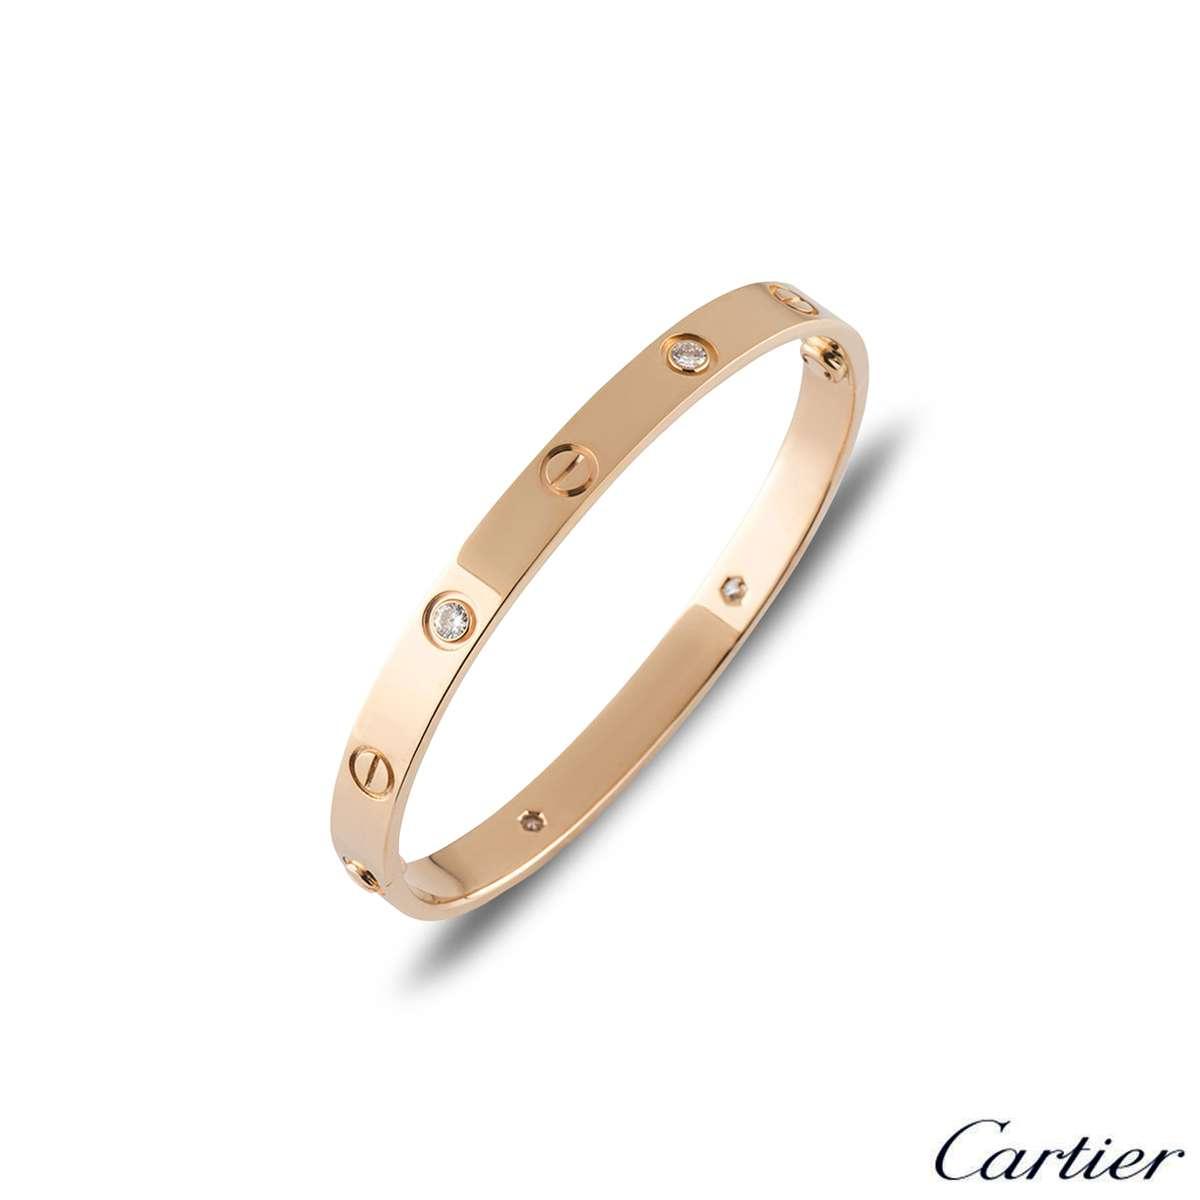 Cartier Love Bracelet Rose Gold Half Diamond Size 16 B6036016